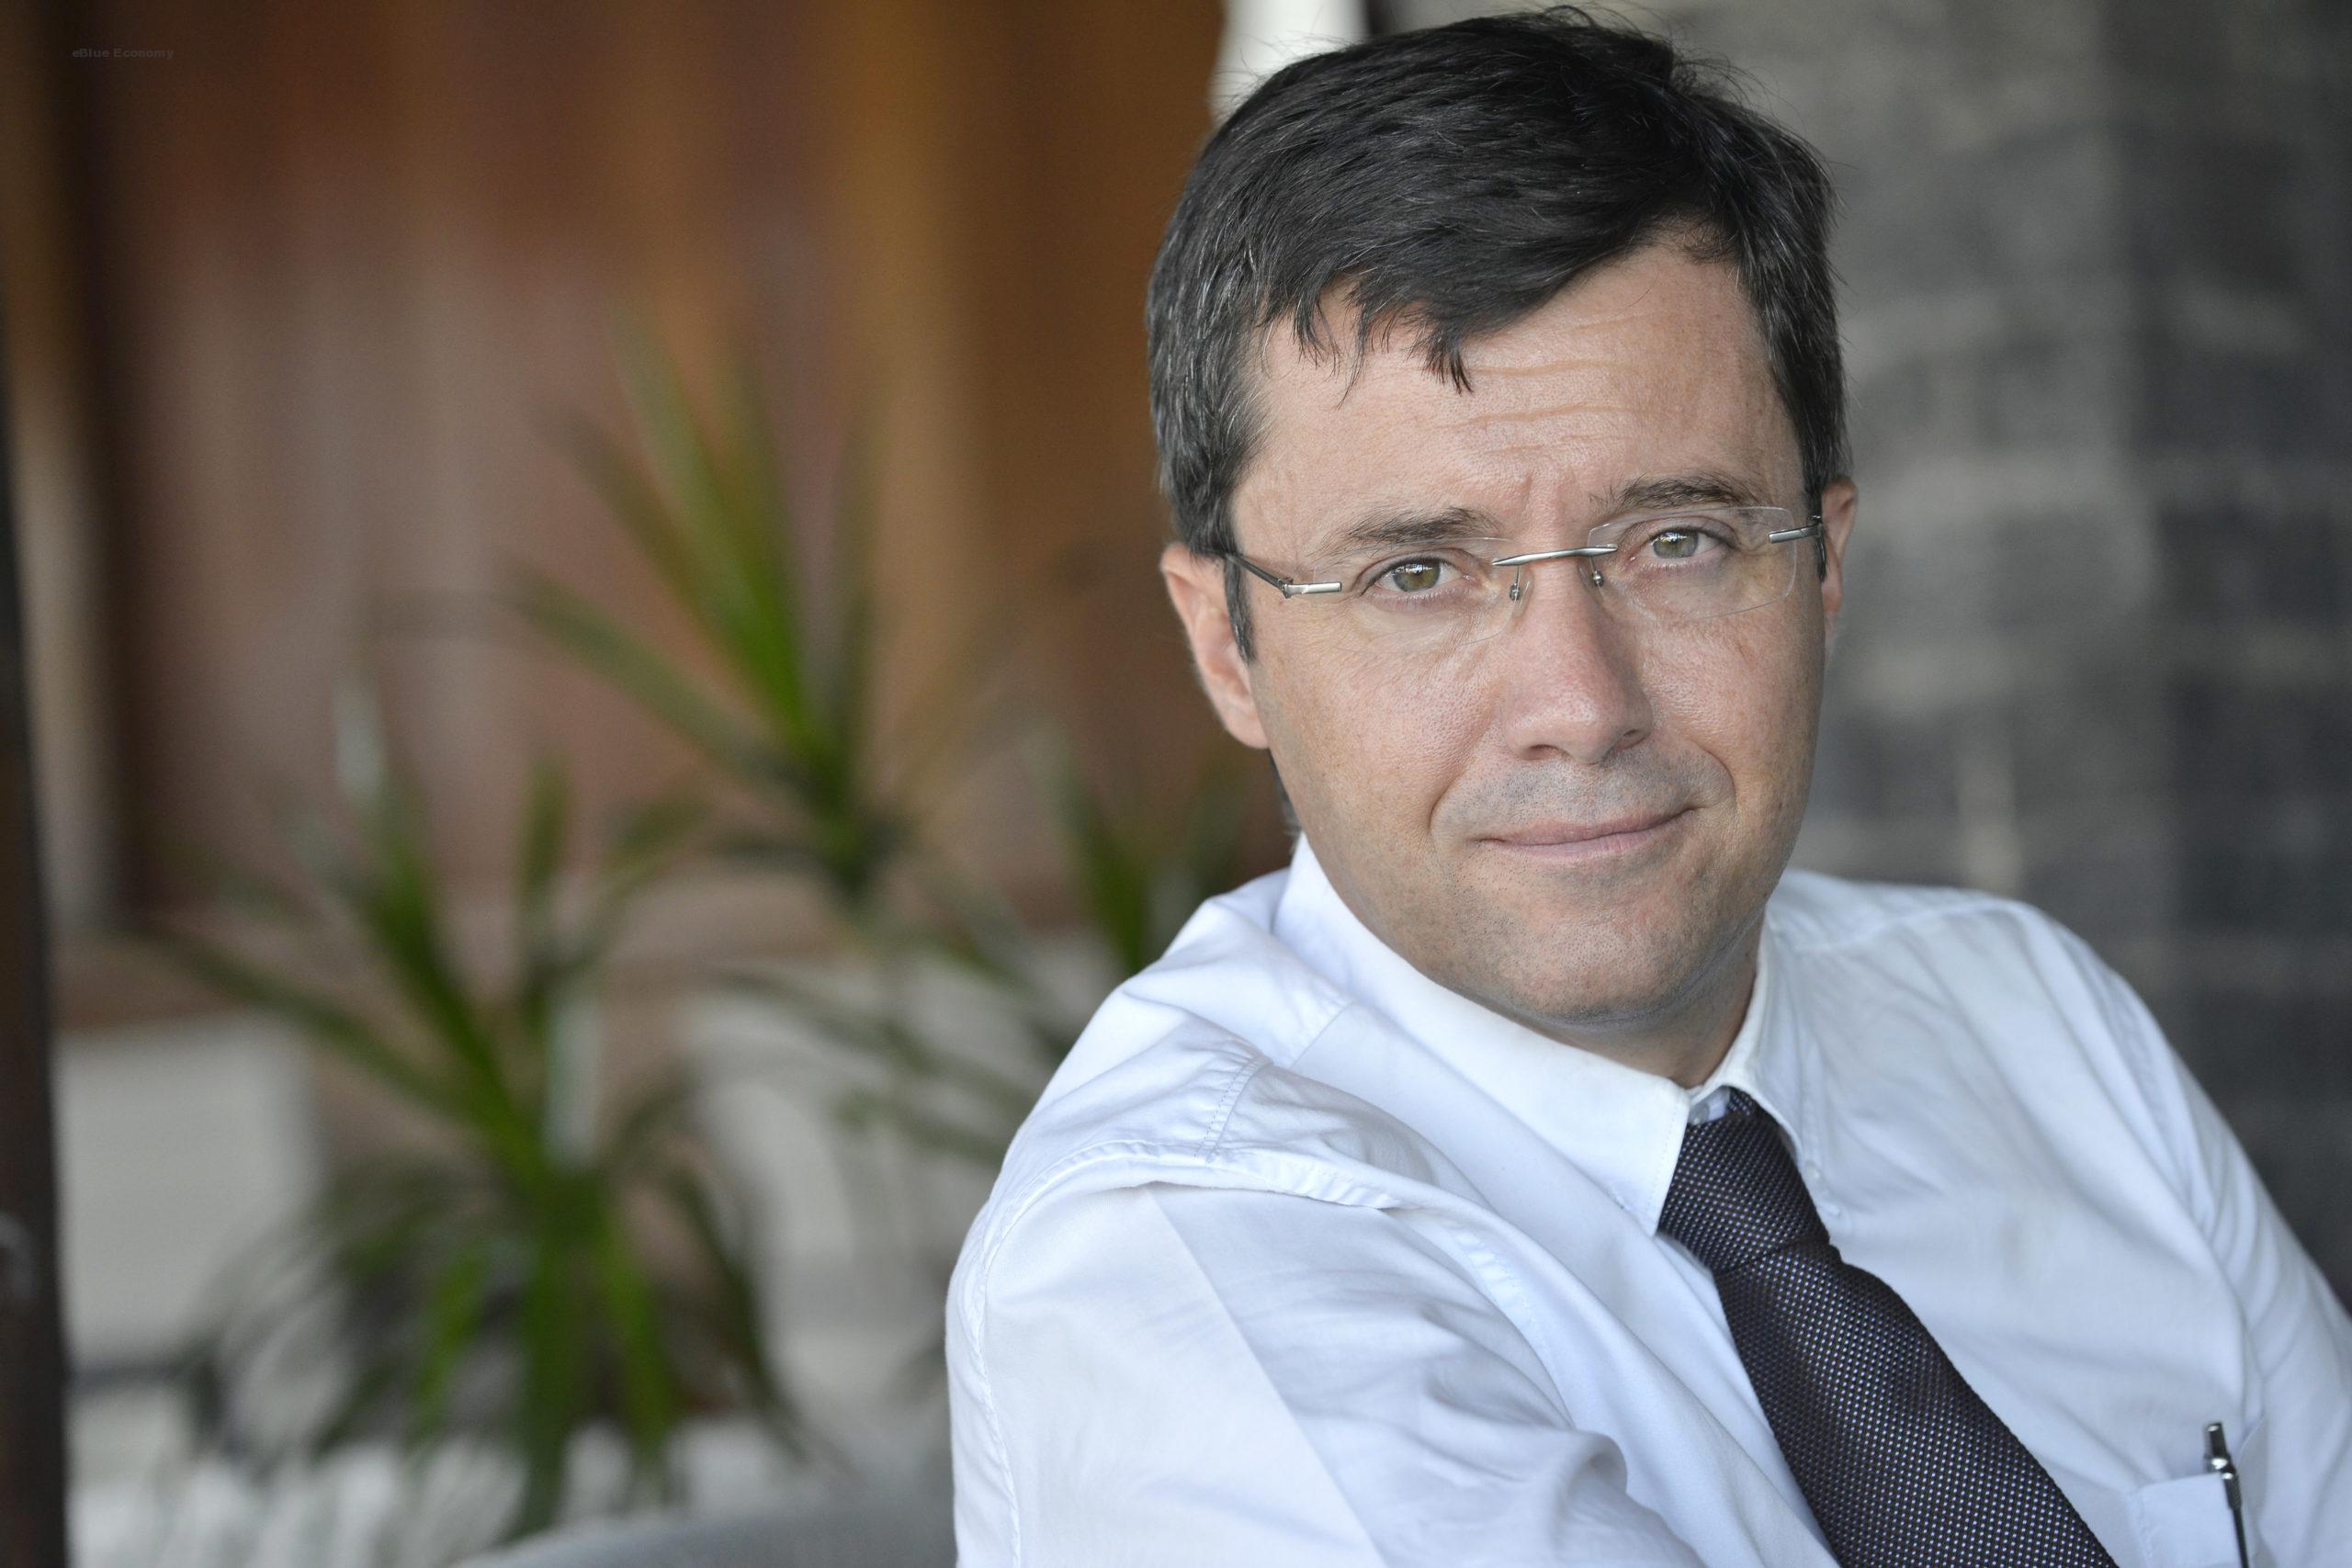 eBlue_economy_Mr. Stéphane Raison, CEO of the Port of Dunkirk